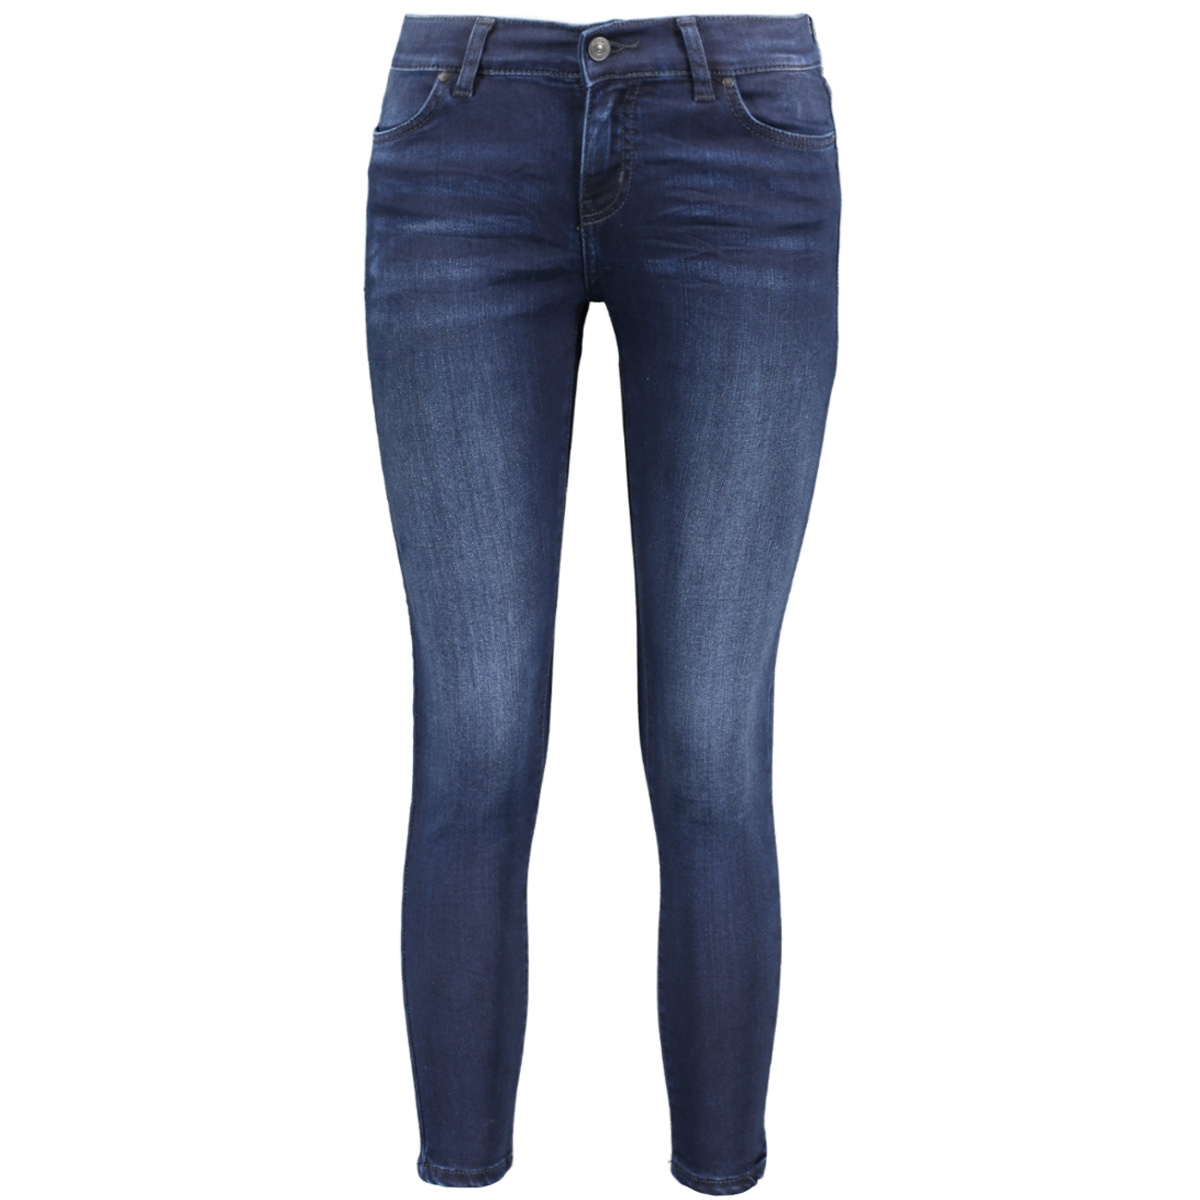 lonia 1009 51032 14530 ltb jeans 51933